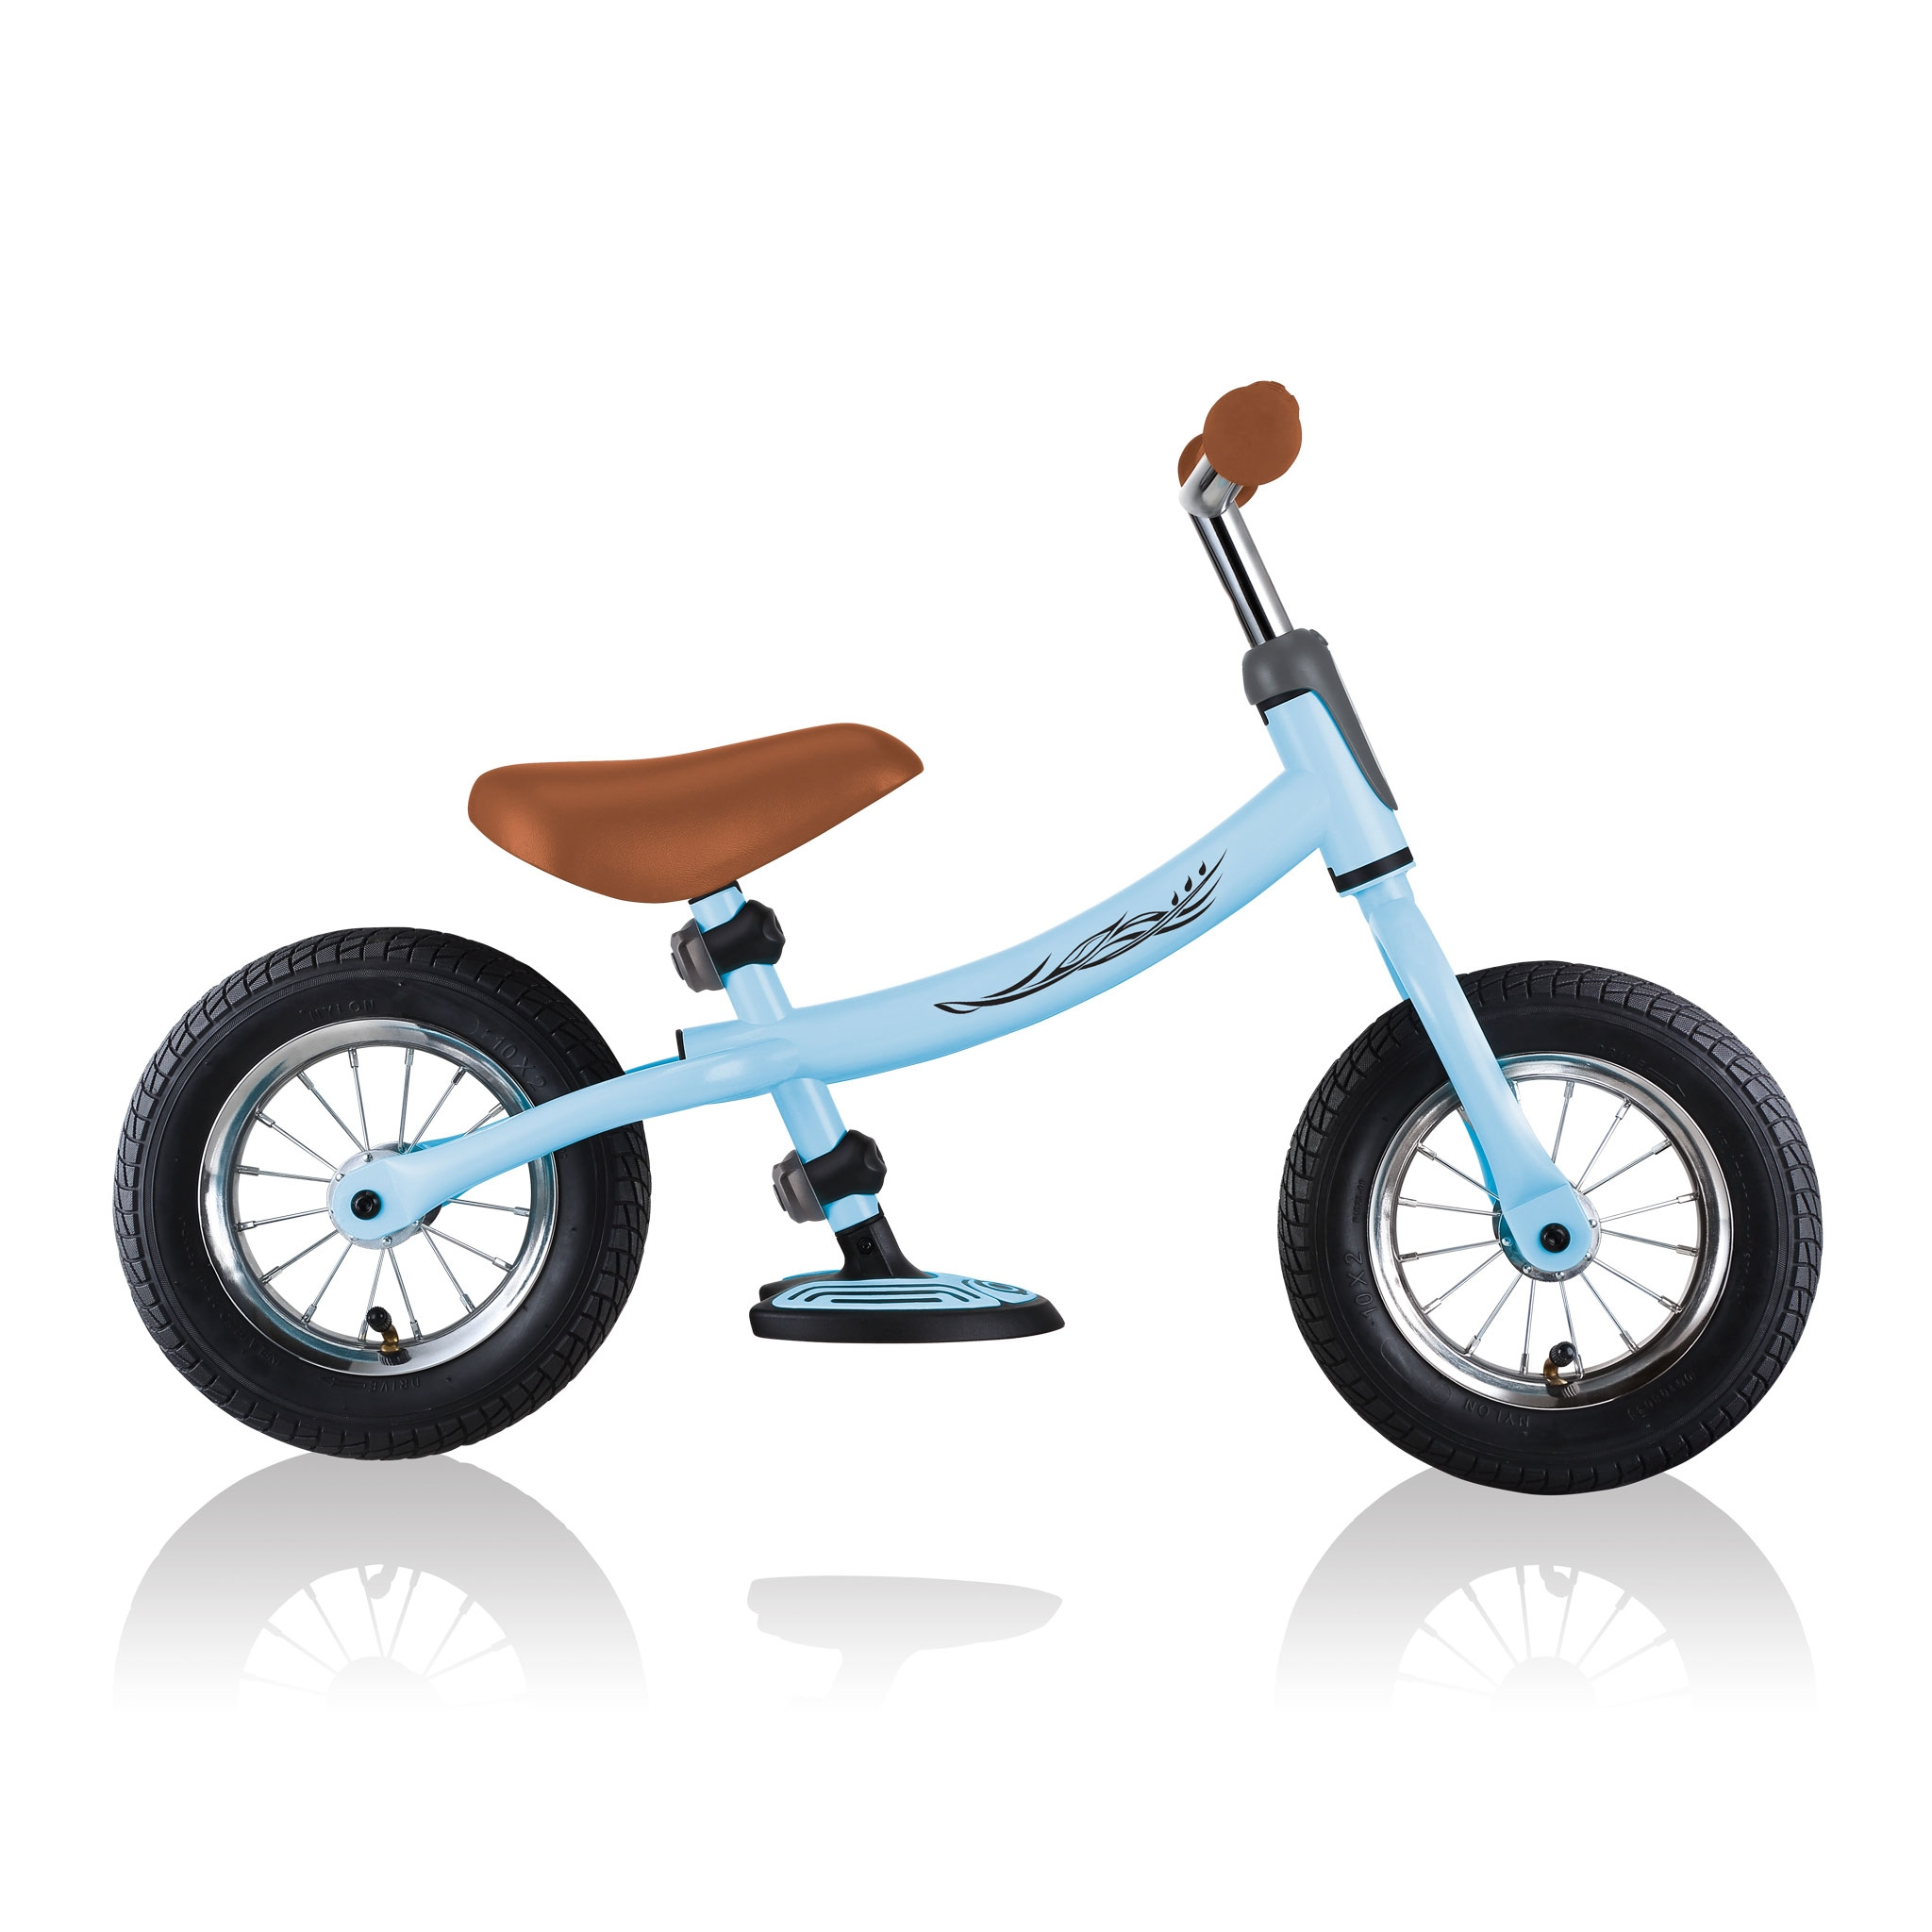 GO-BIKE-AIR-toddler-balance-bike-transform-bike-frame-from-low-frame-position-into-high-frame-position_pastel-blue 4